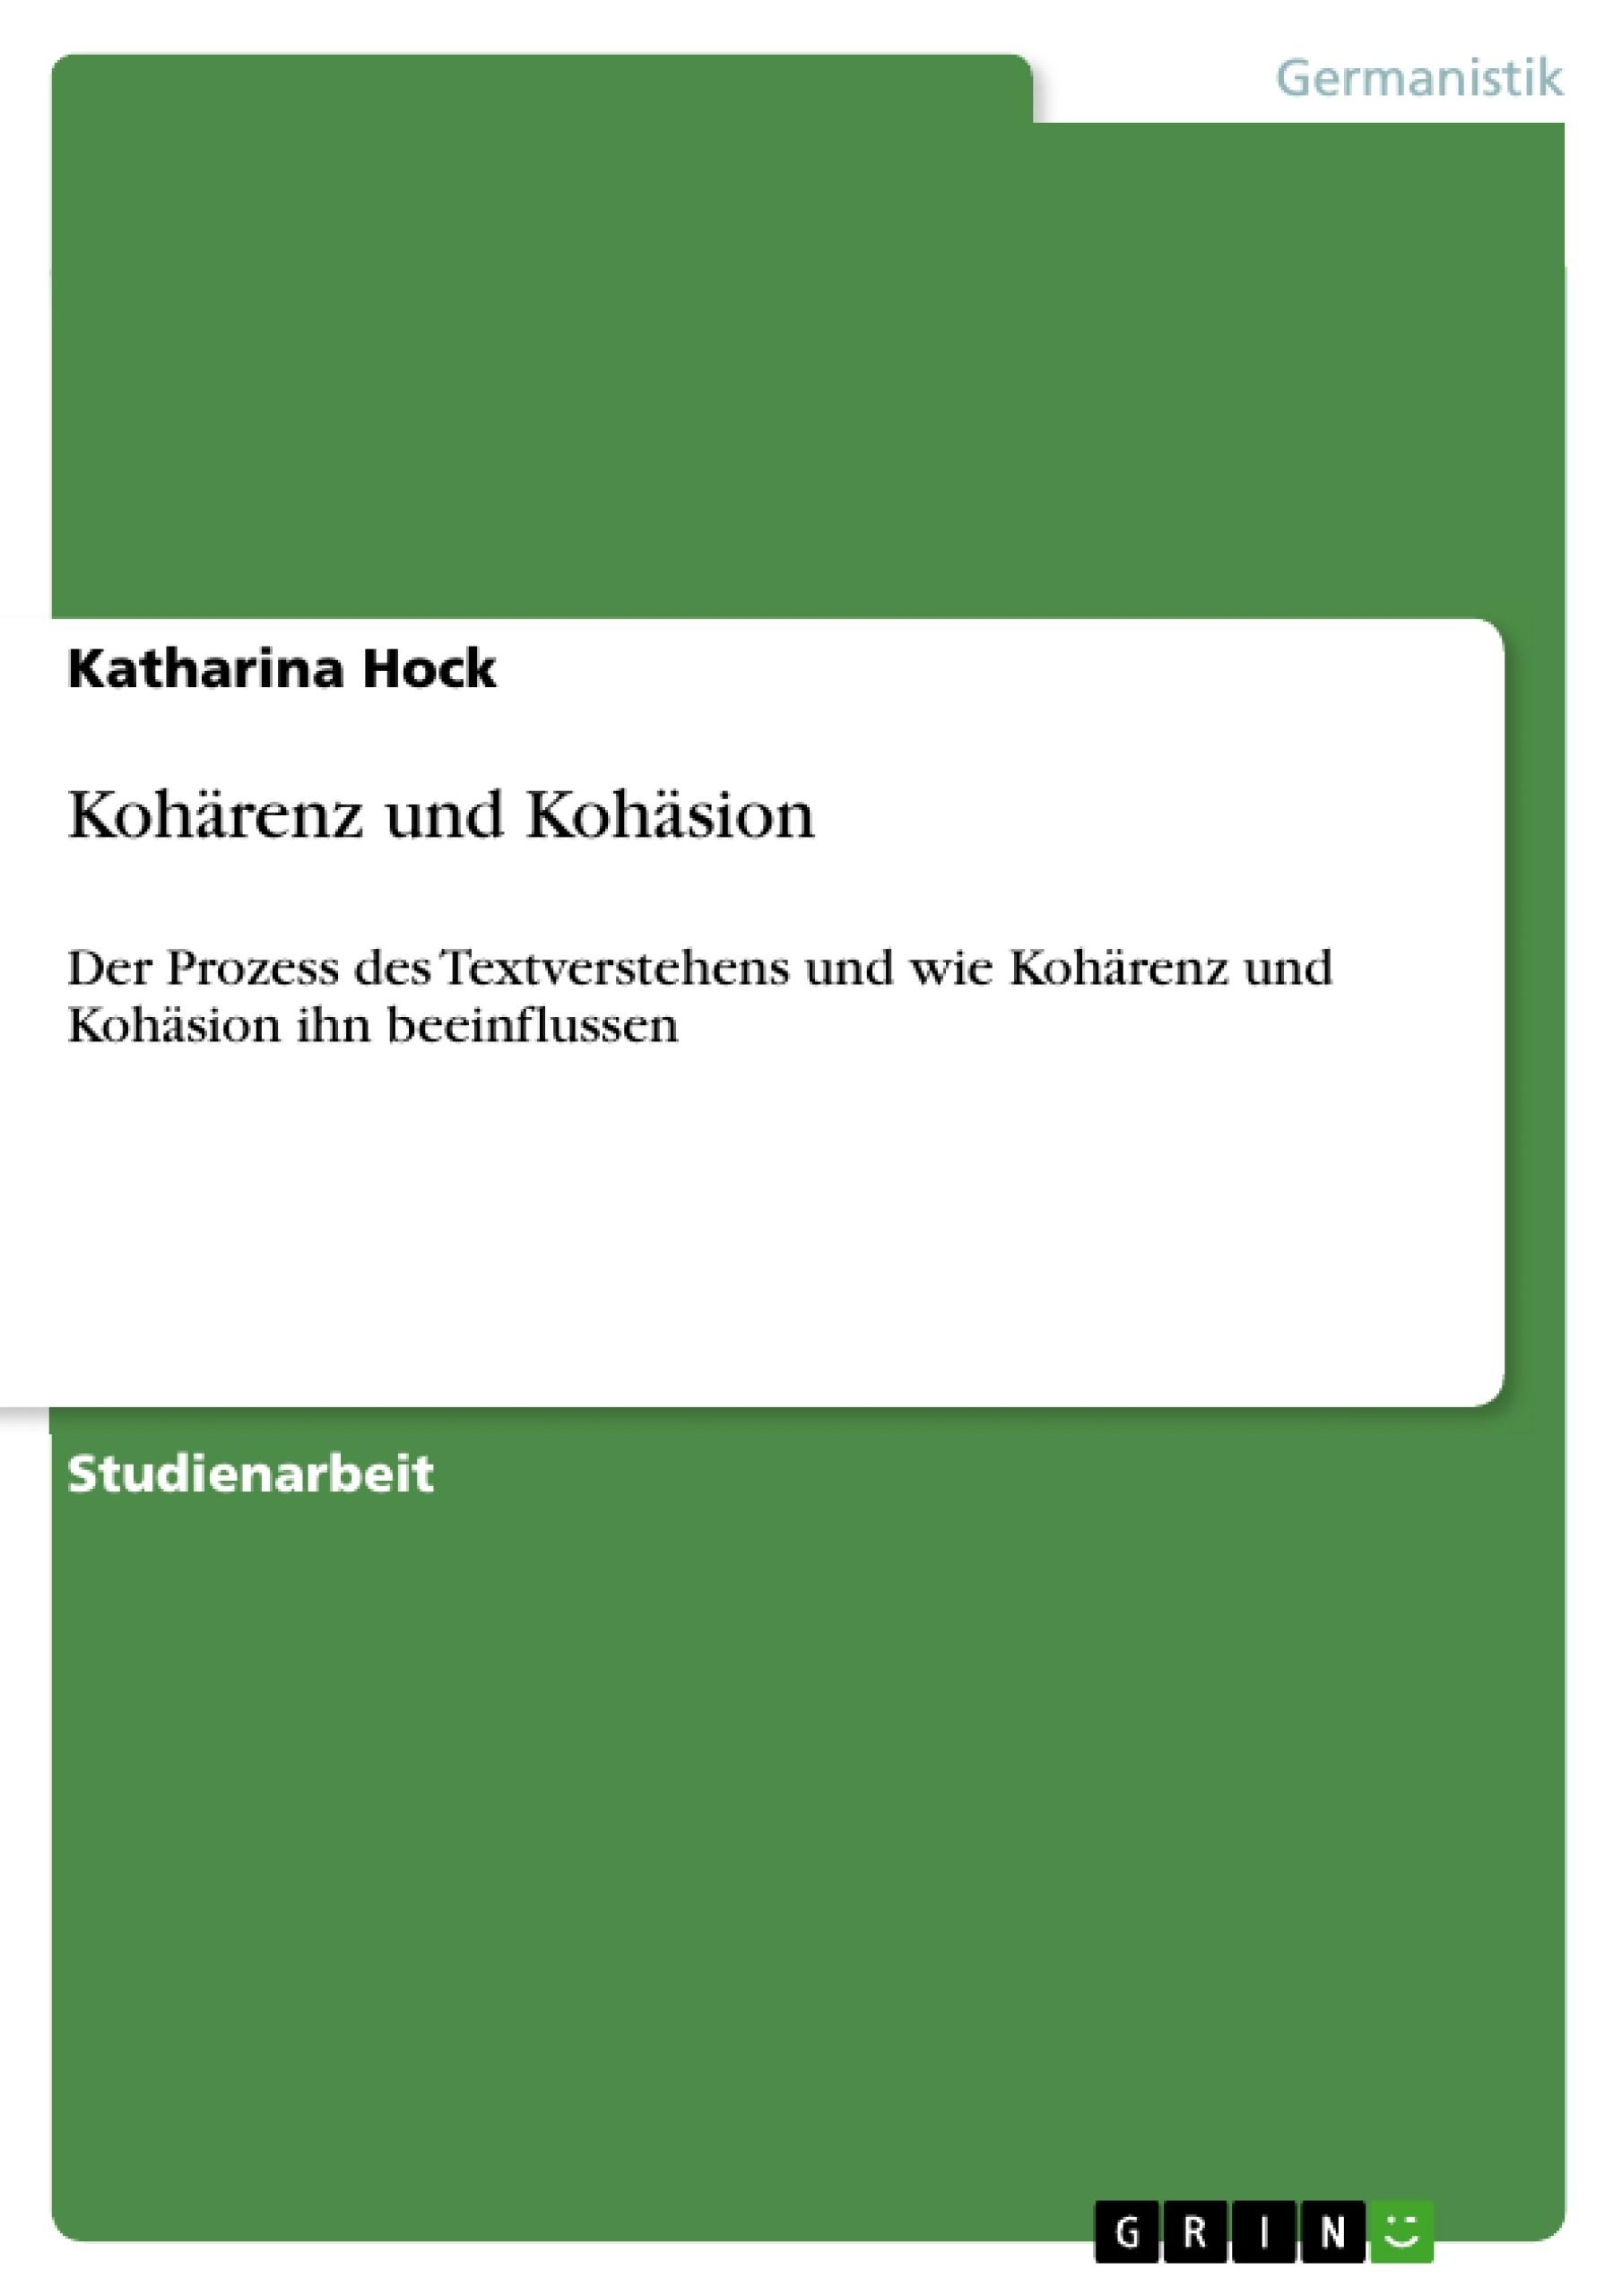 Titel: Kohärenz und Kohäsion